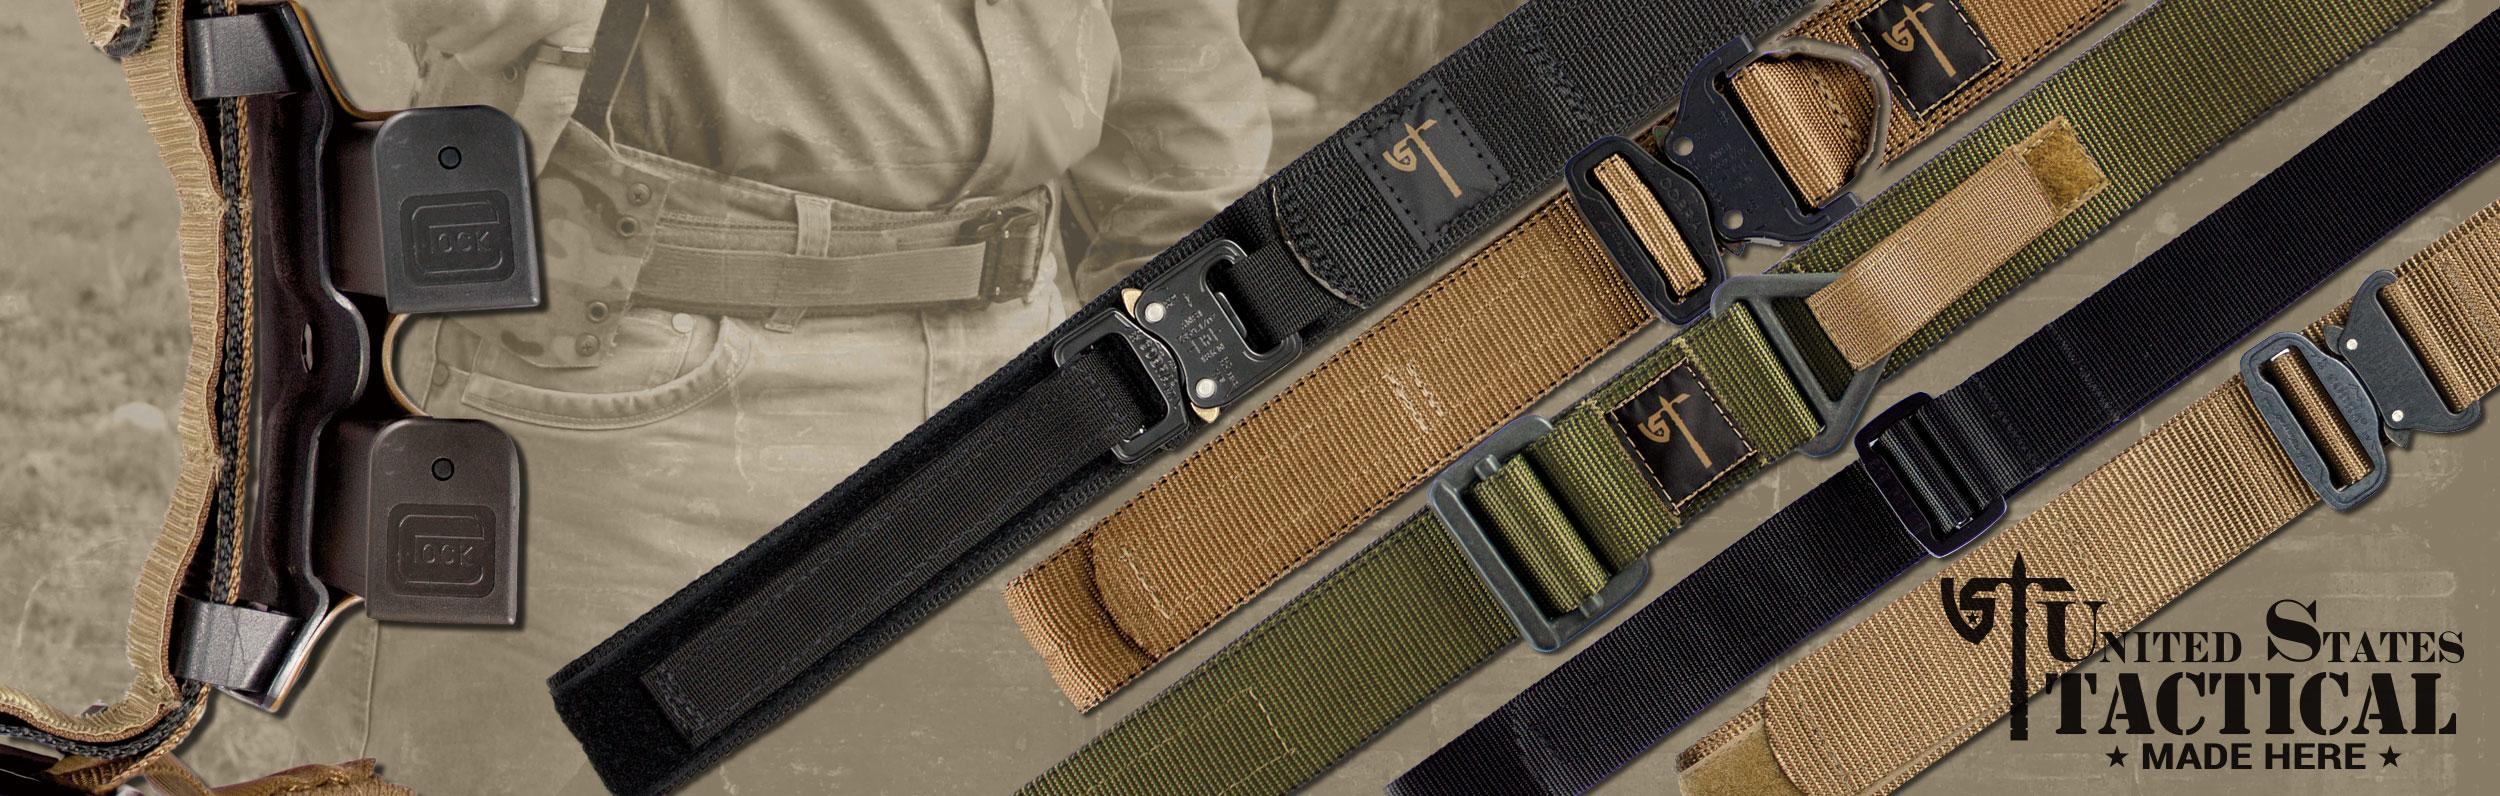 belts-banner-2.jpg